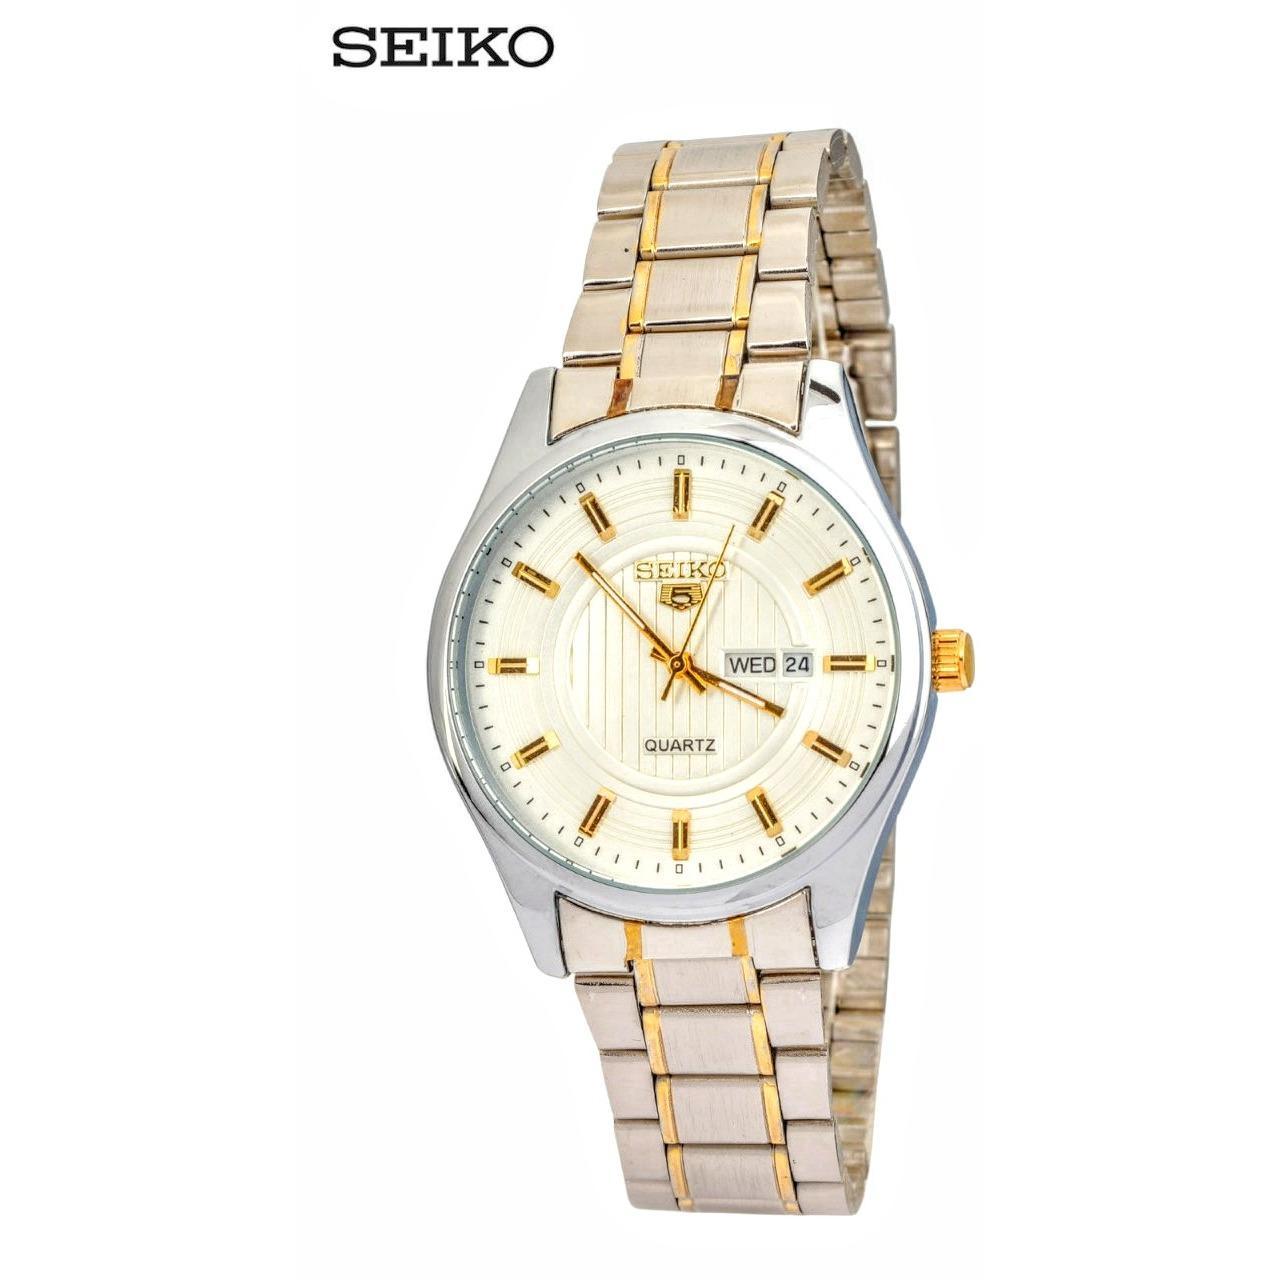 SEIKO 5  - Jam Tangan Pria - Silver - Stainless Steel - 78NKNS